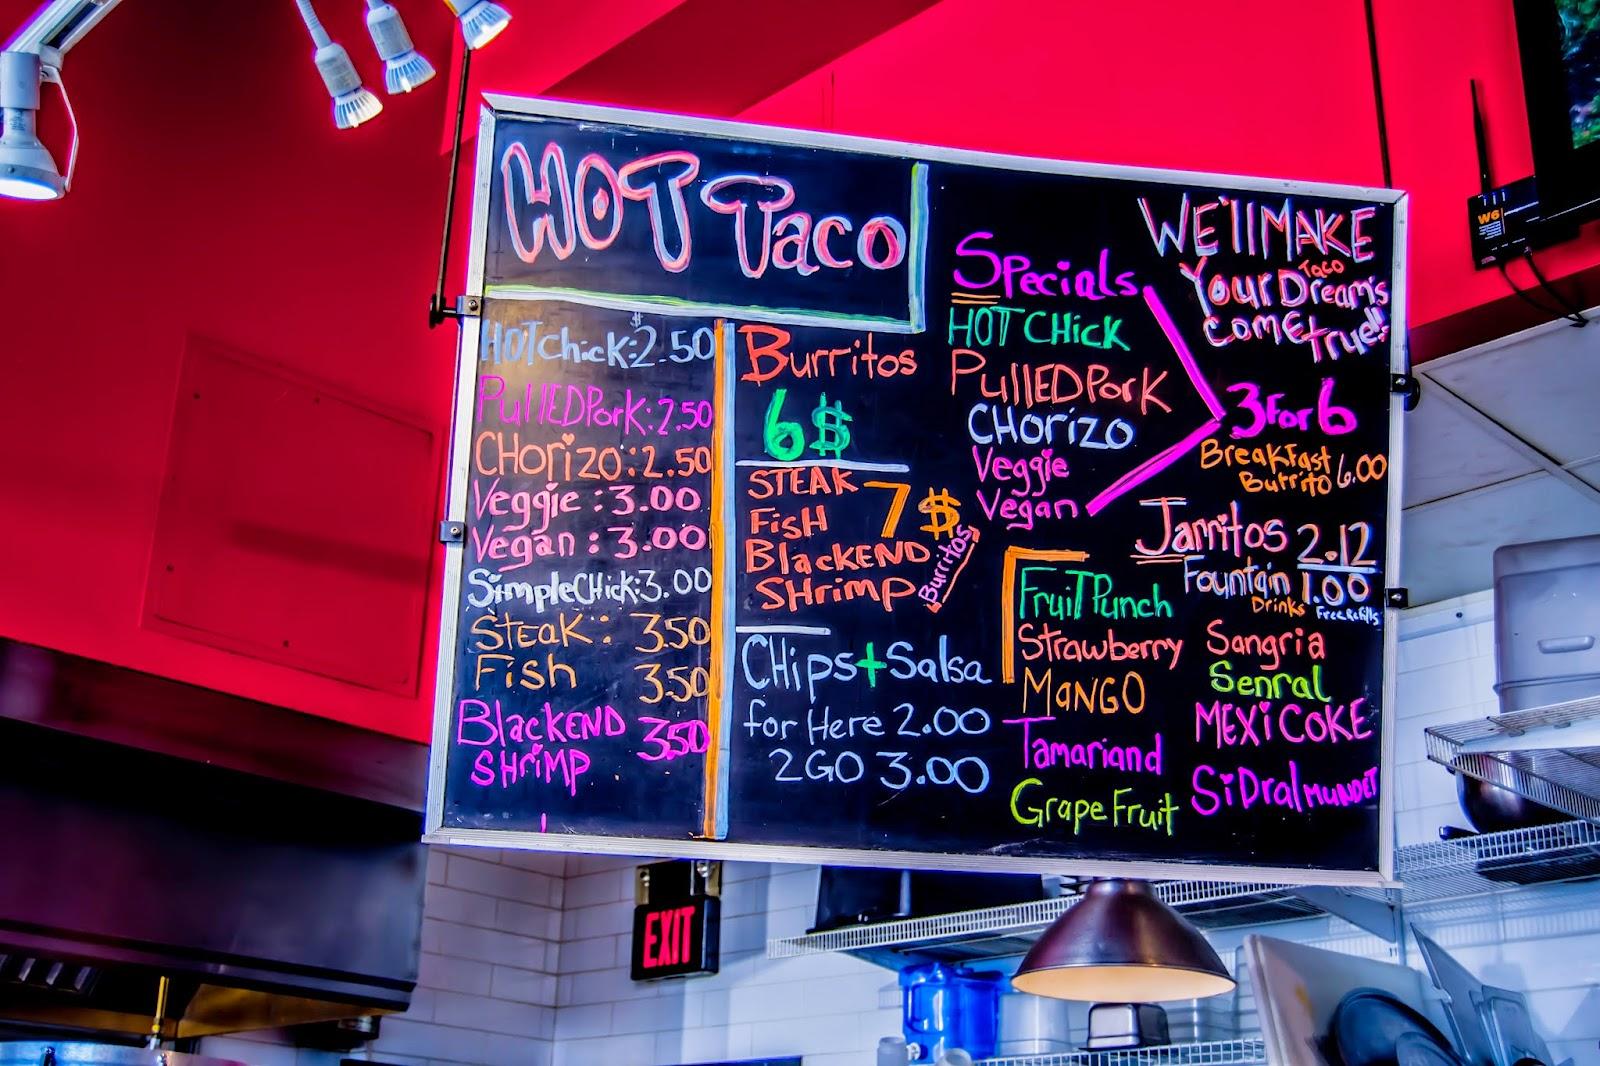 hot taco detroit